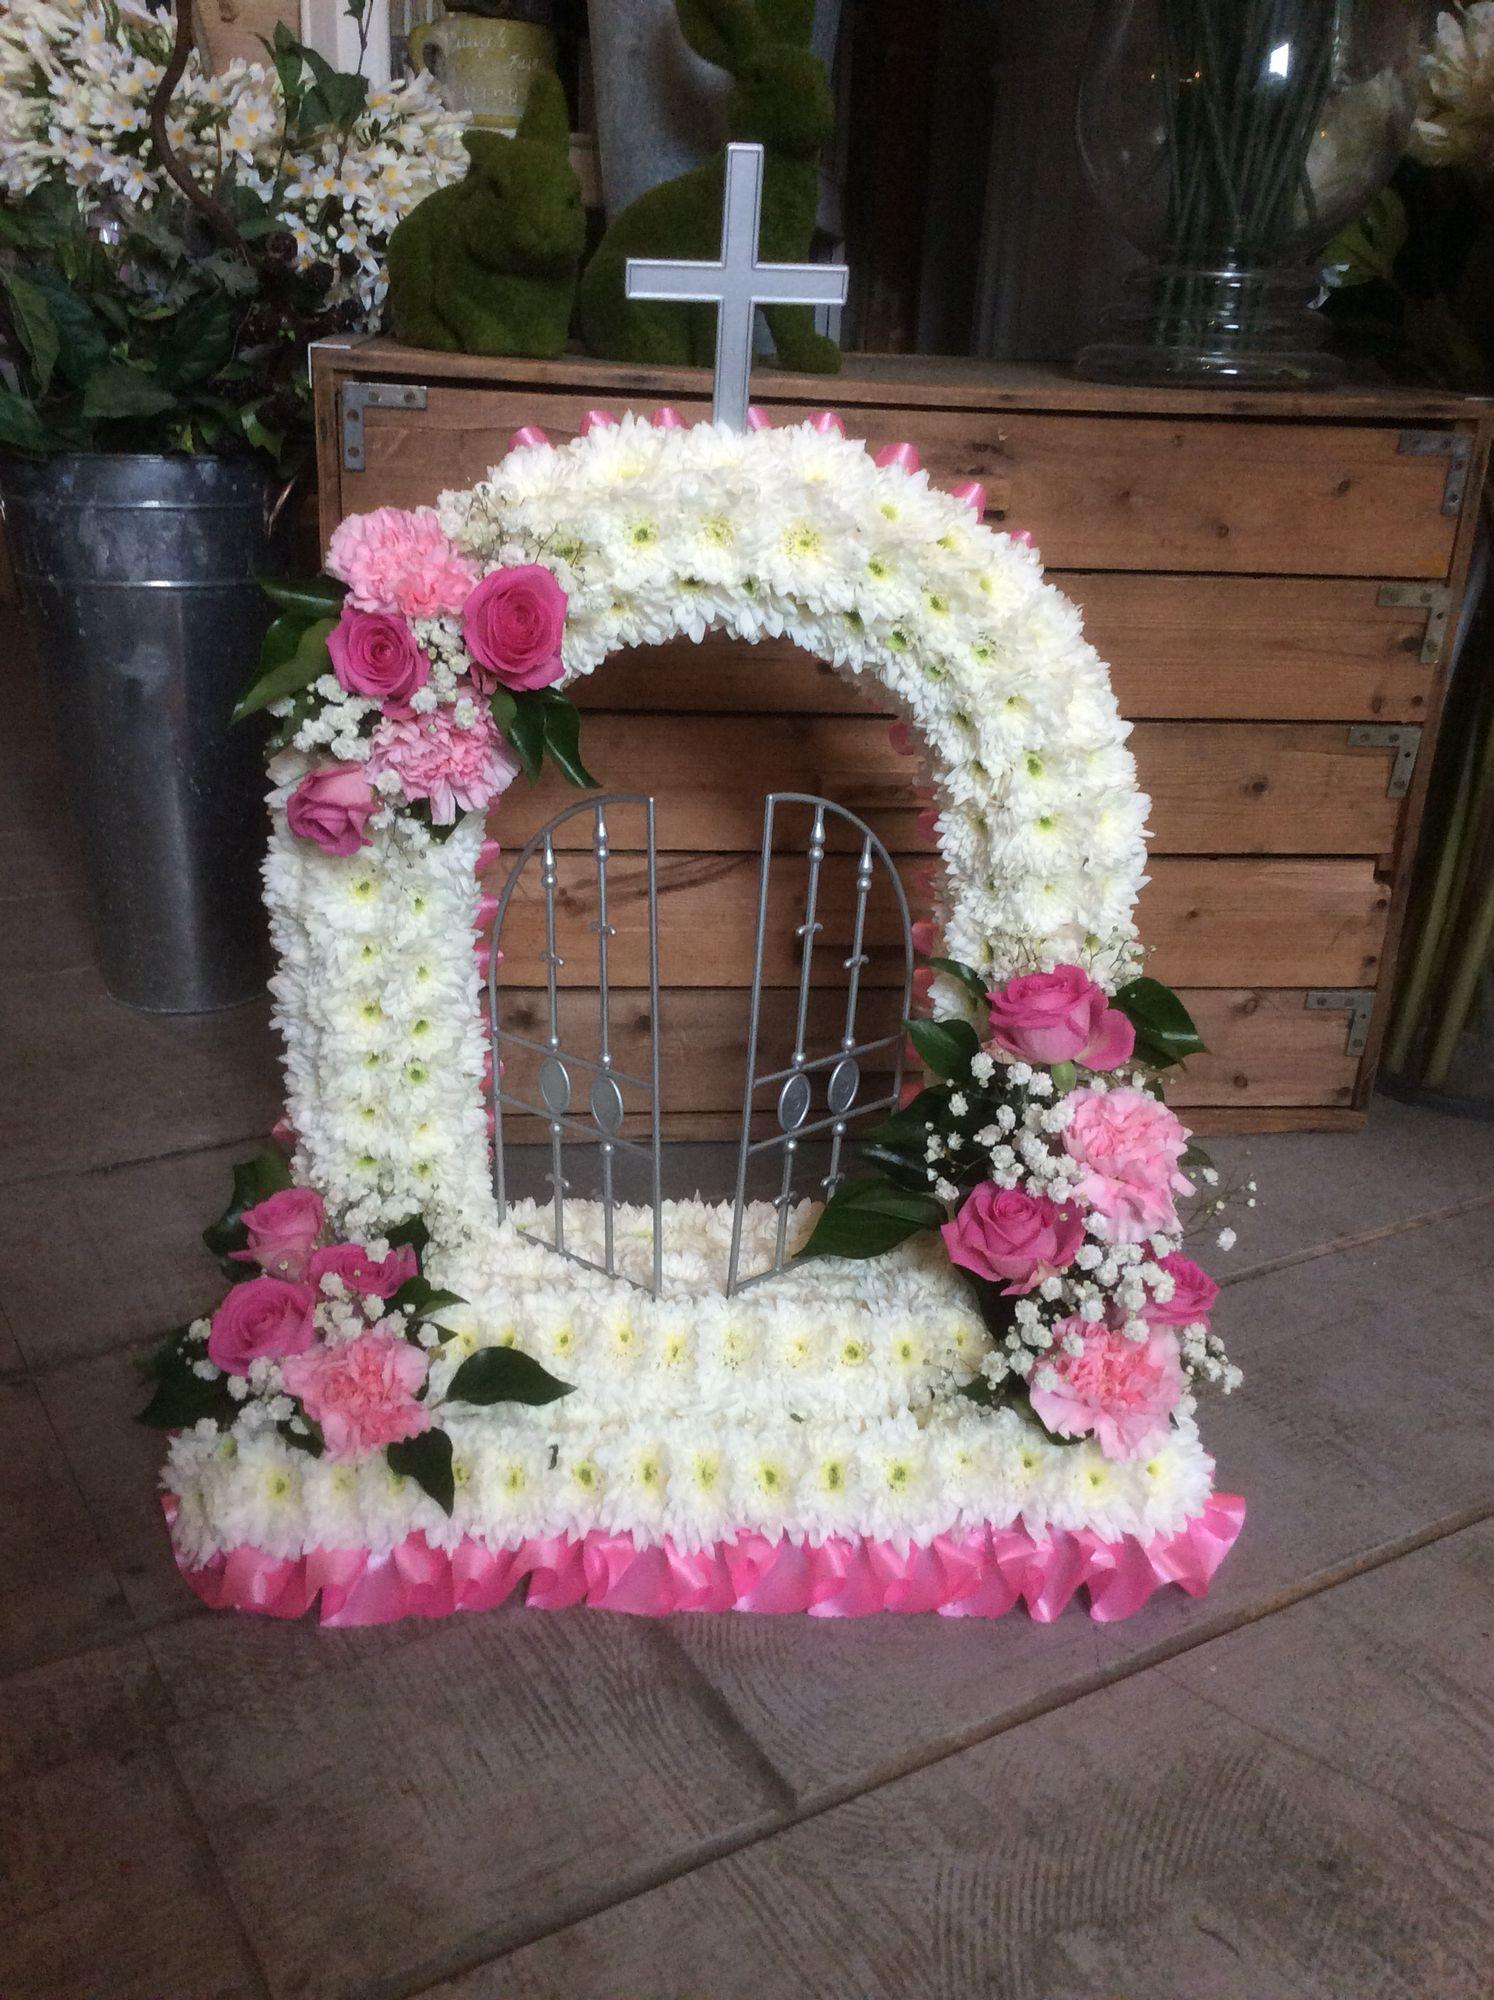 Gates of heaven funeral flower tribute funeral flower tributes gates of heaven funeral flower tribute izmirmasajfo